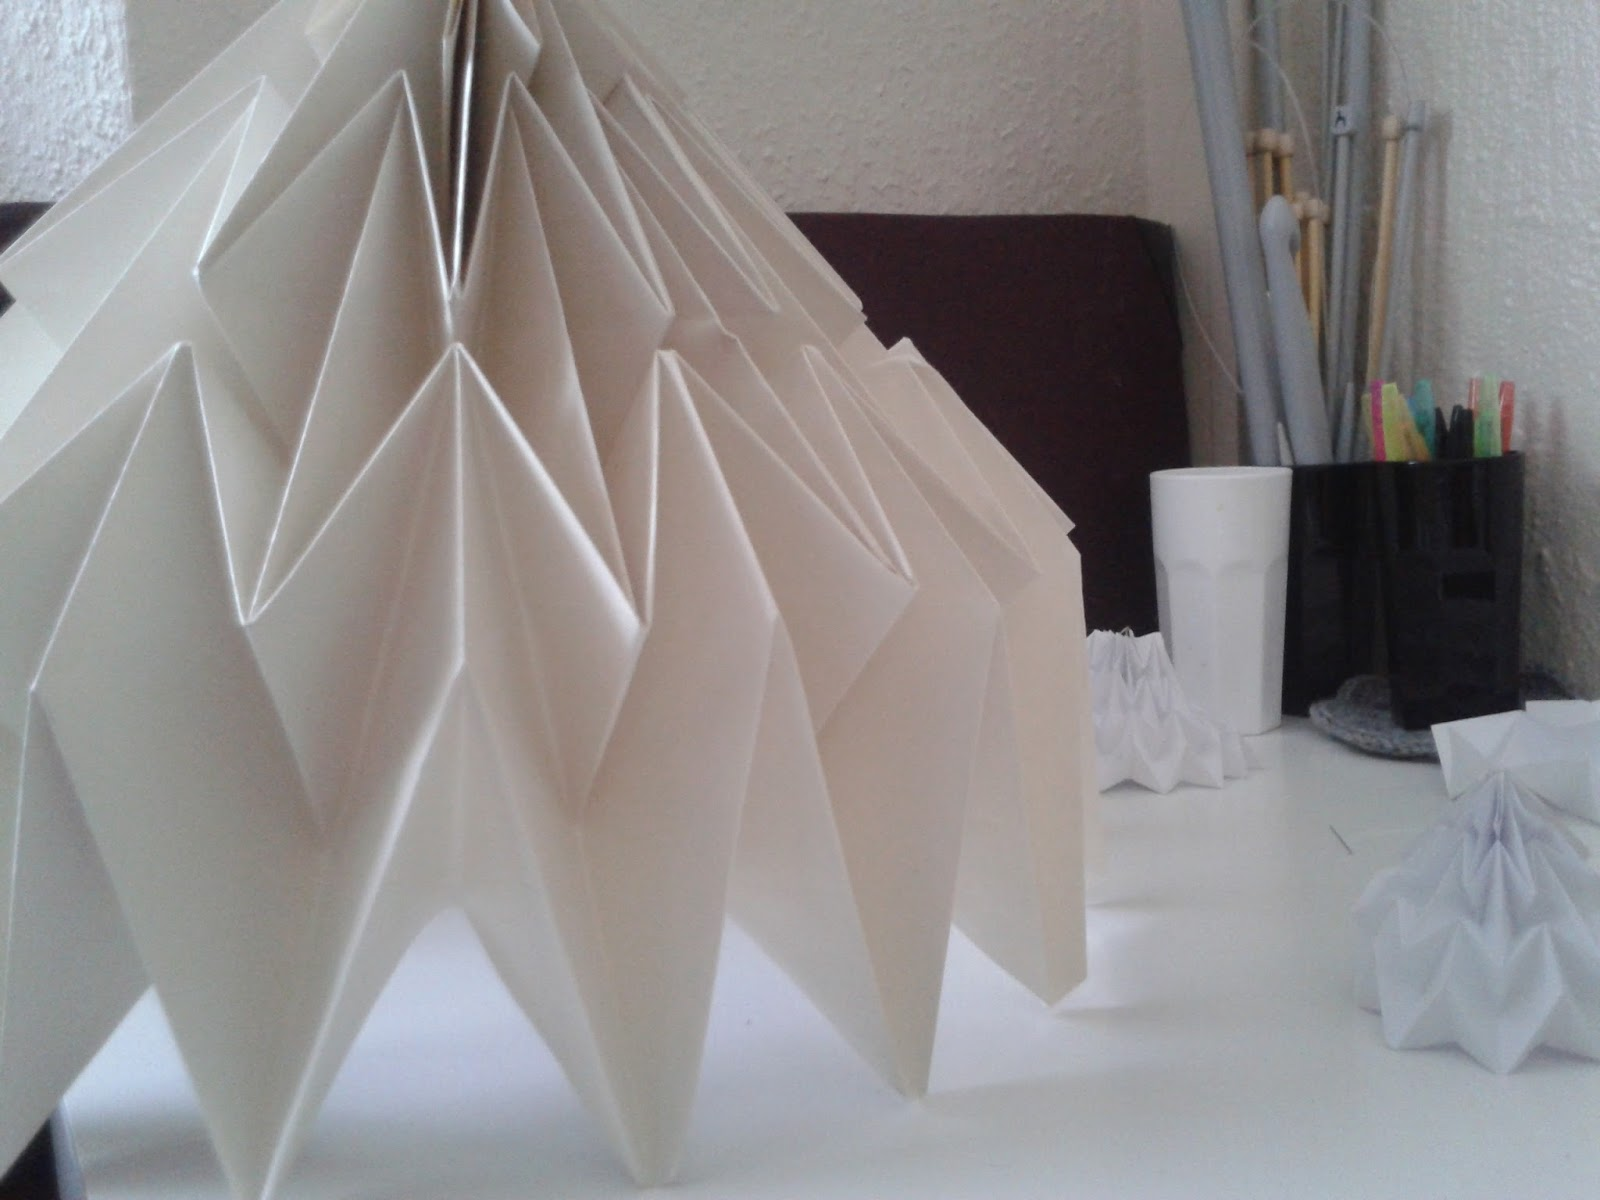 Memnos and mesmer diy origami lampshade diy origami lampshade aloadofball Gallery